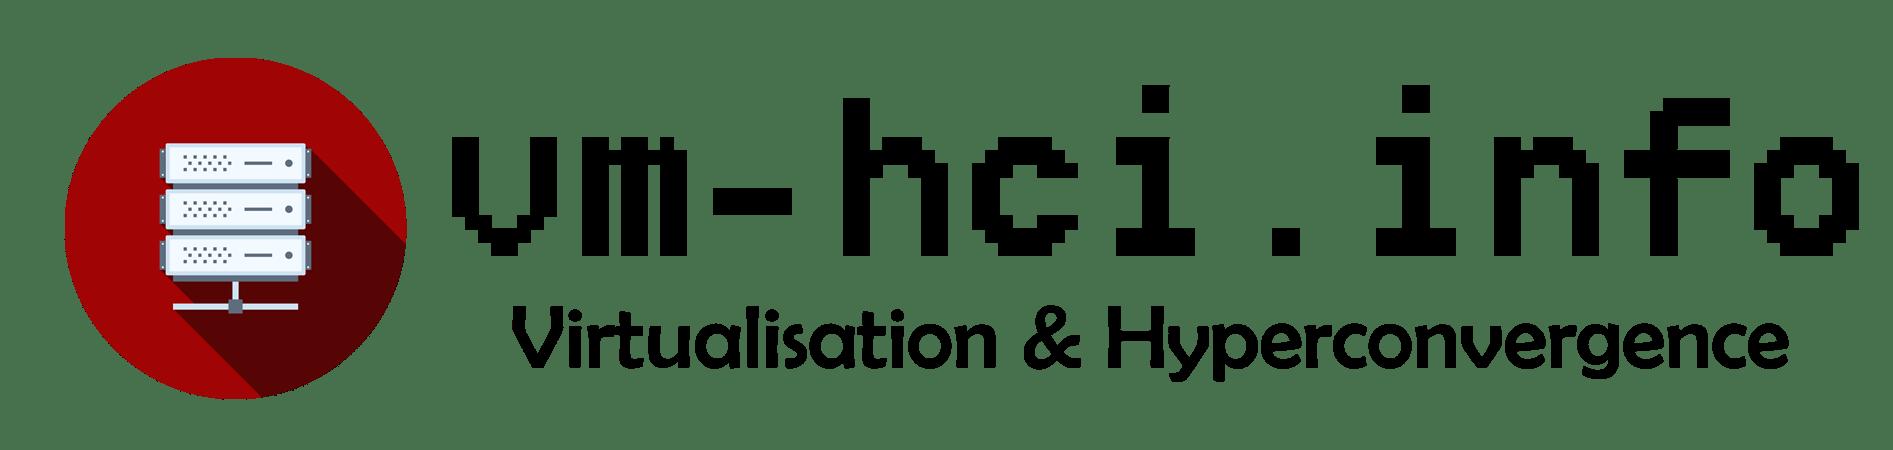 Virtualisation & Hyper-convergence